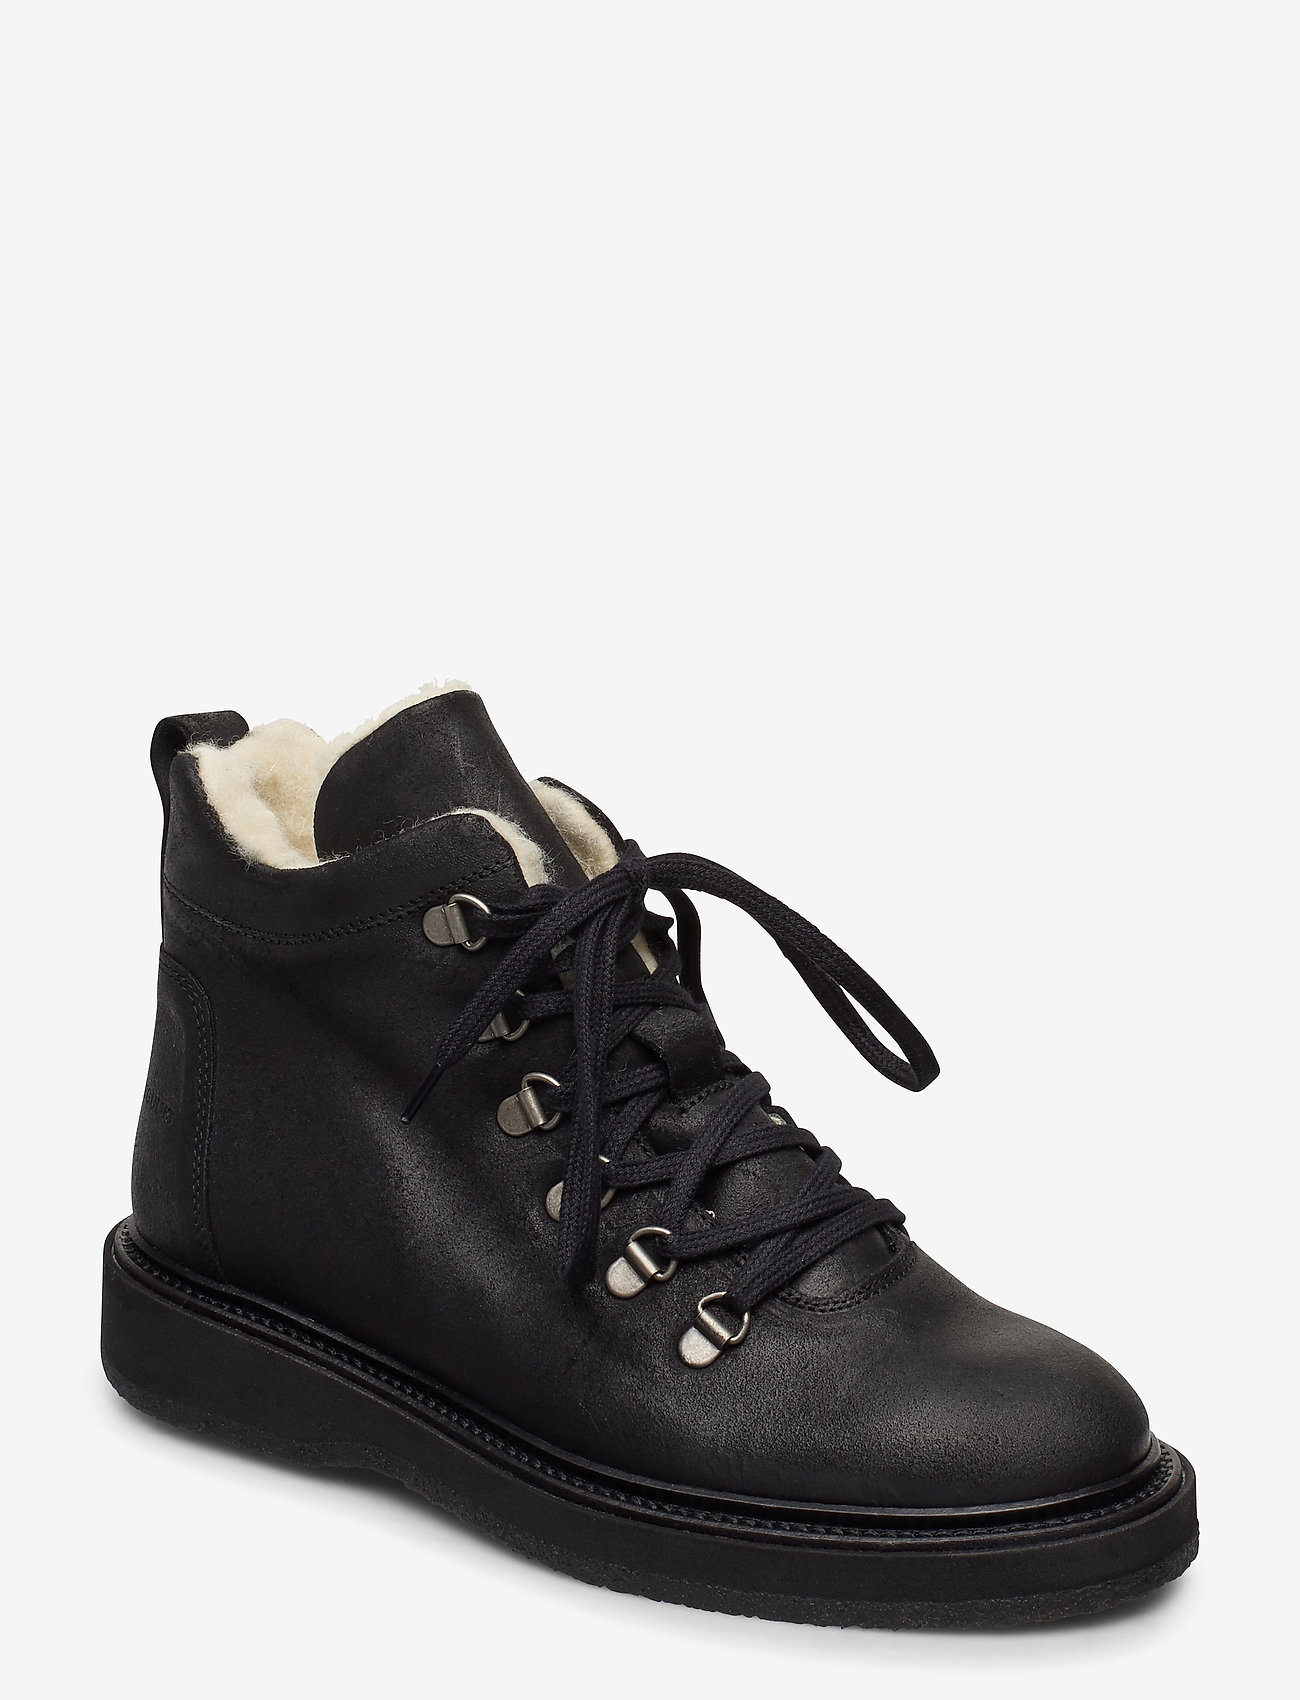 ANGULUS - Boots - flat - flache stiefeletten - 2100 black - 0